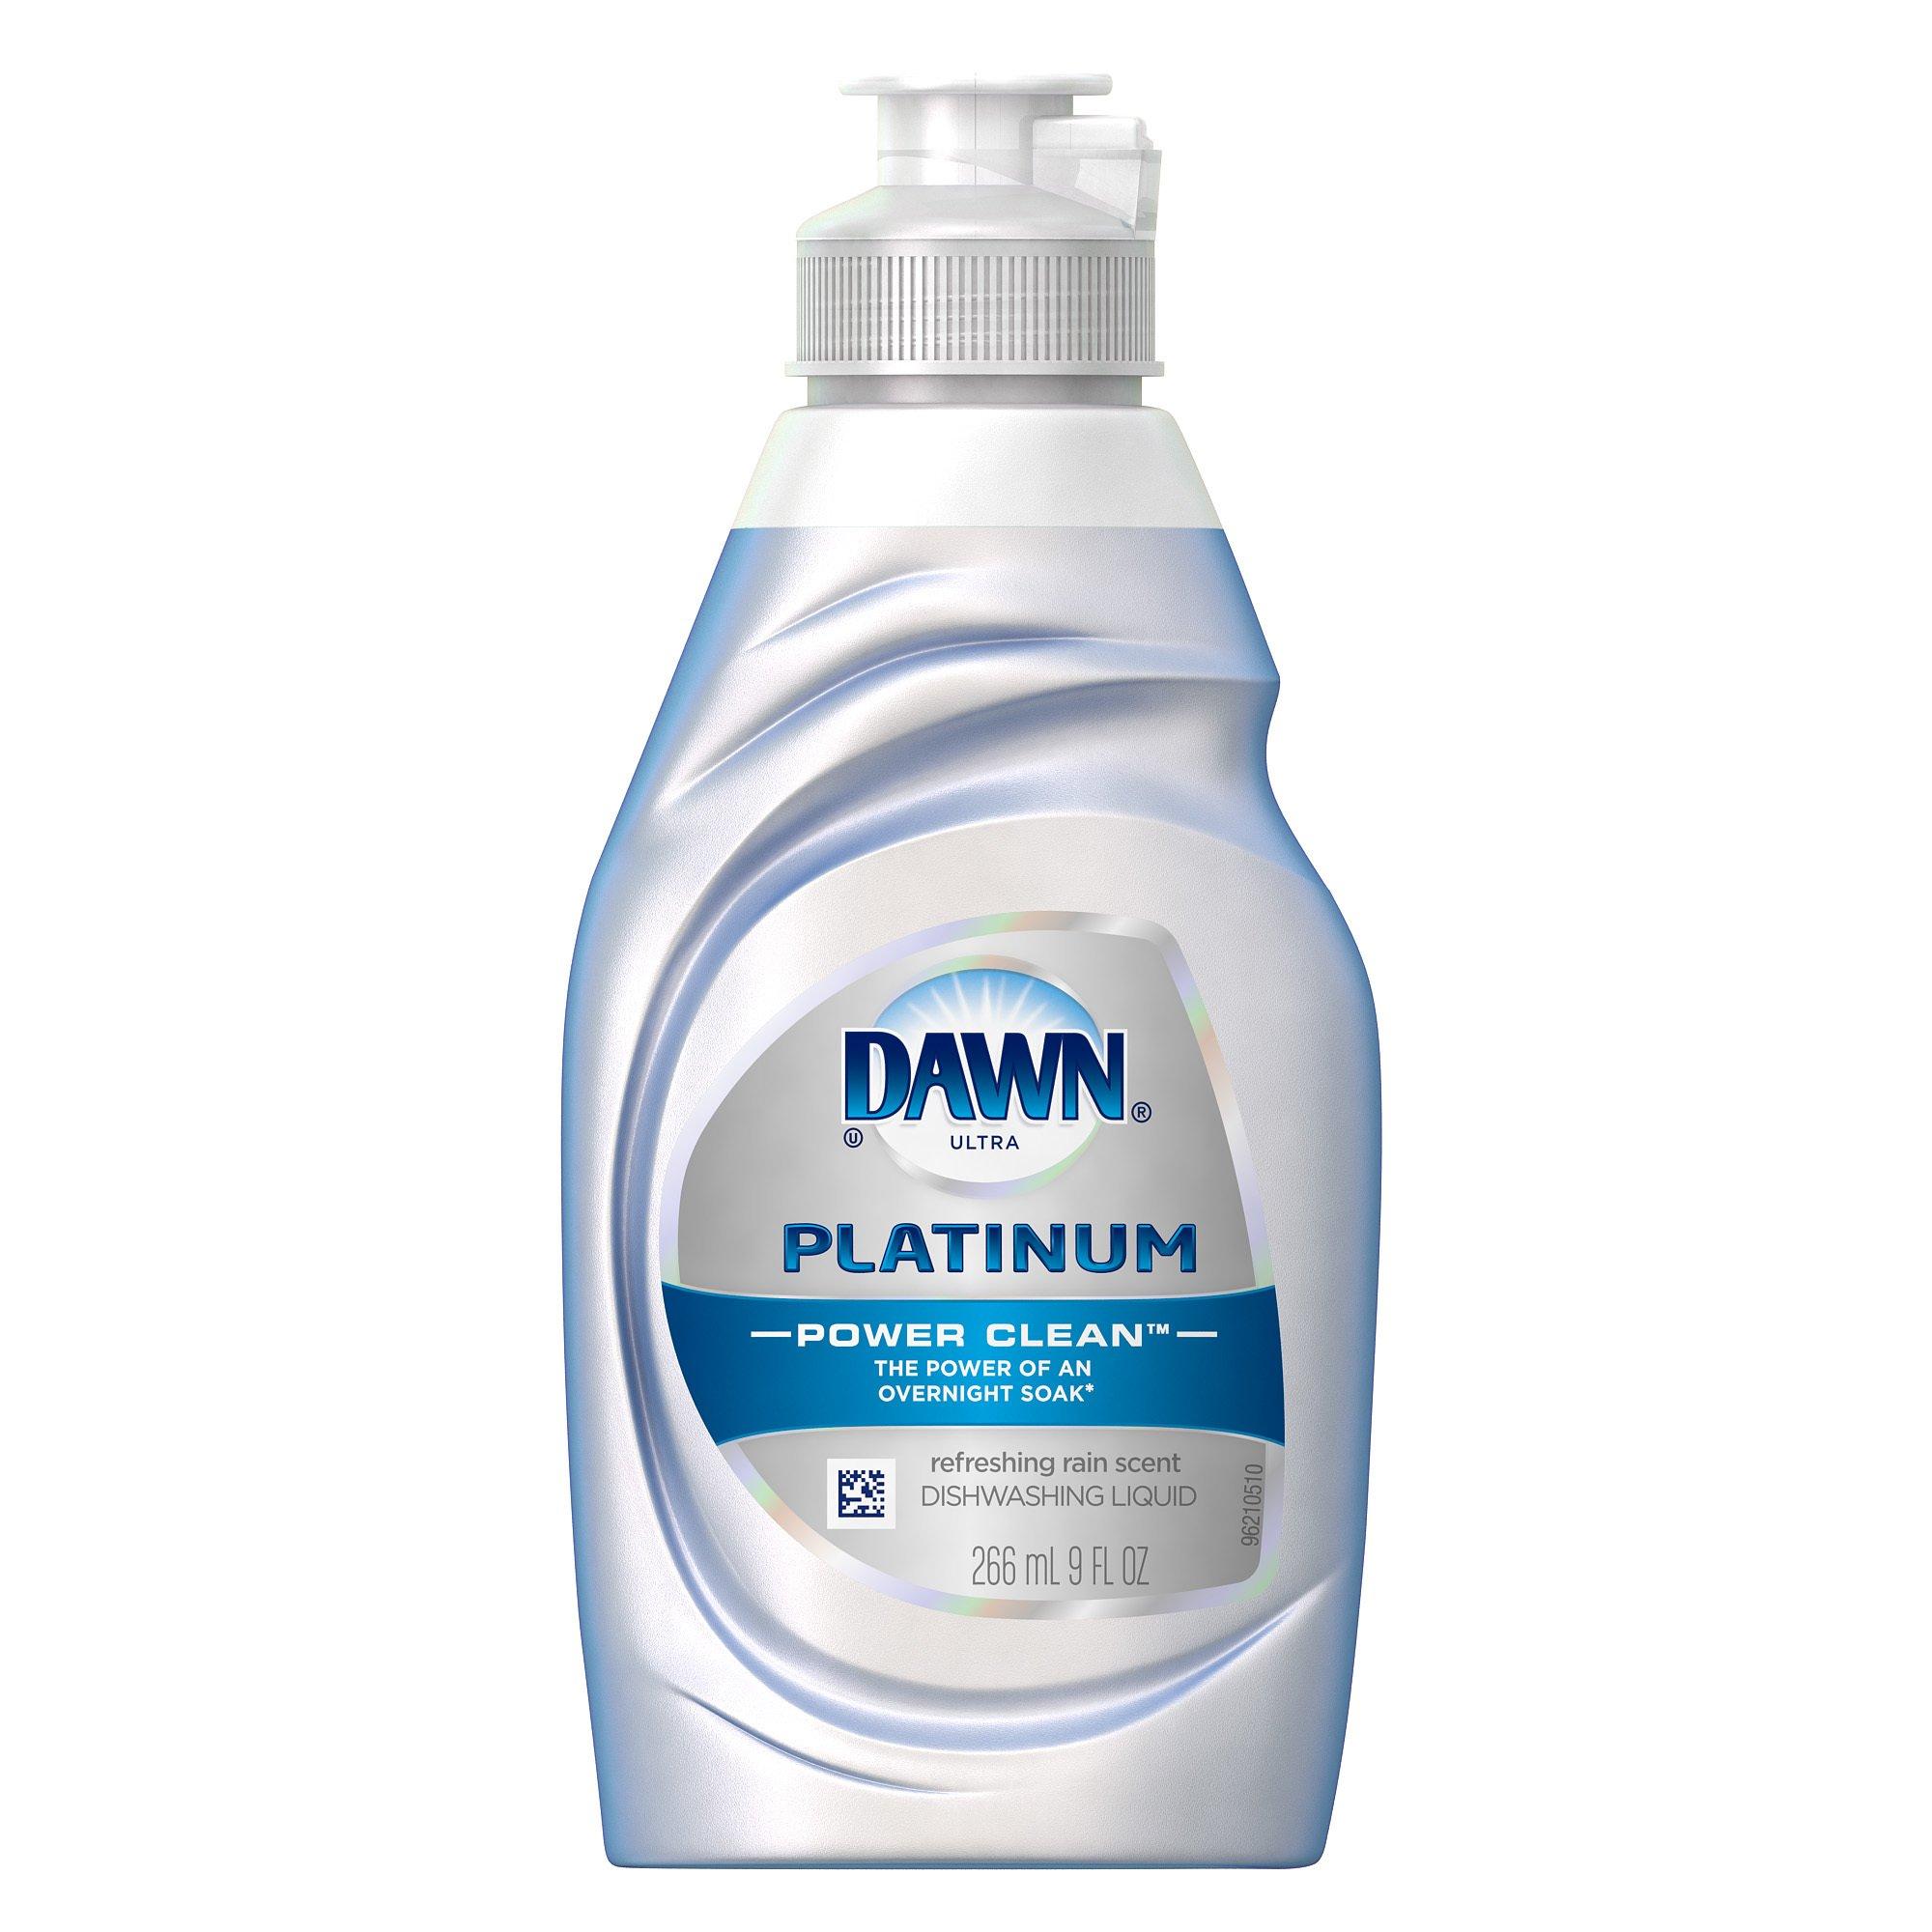 Dawn Ultra Power Clean, Refreshing Rain Scent, Dishwashing Liquid, 9 Fluid Ounce (Pack of 18)